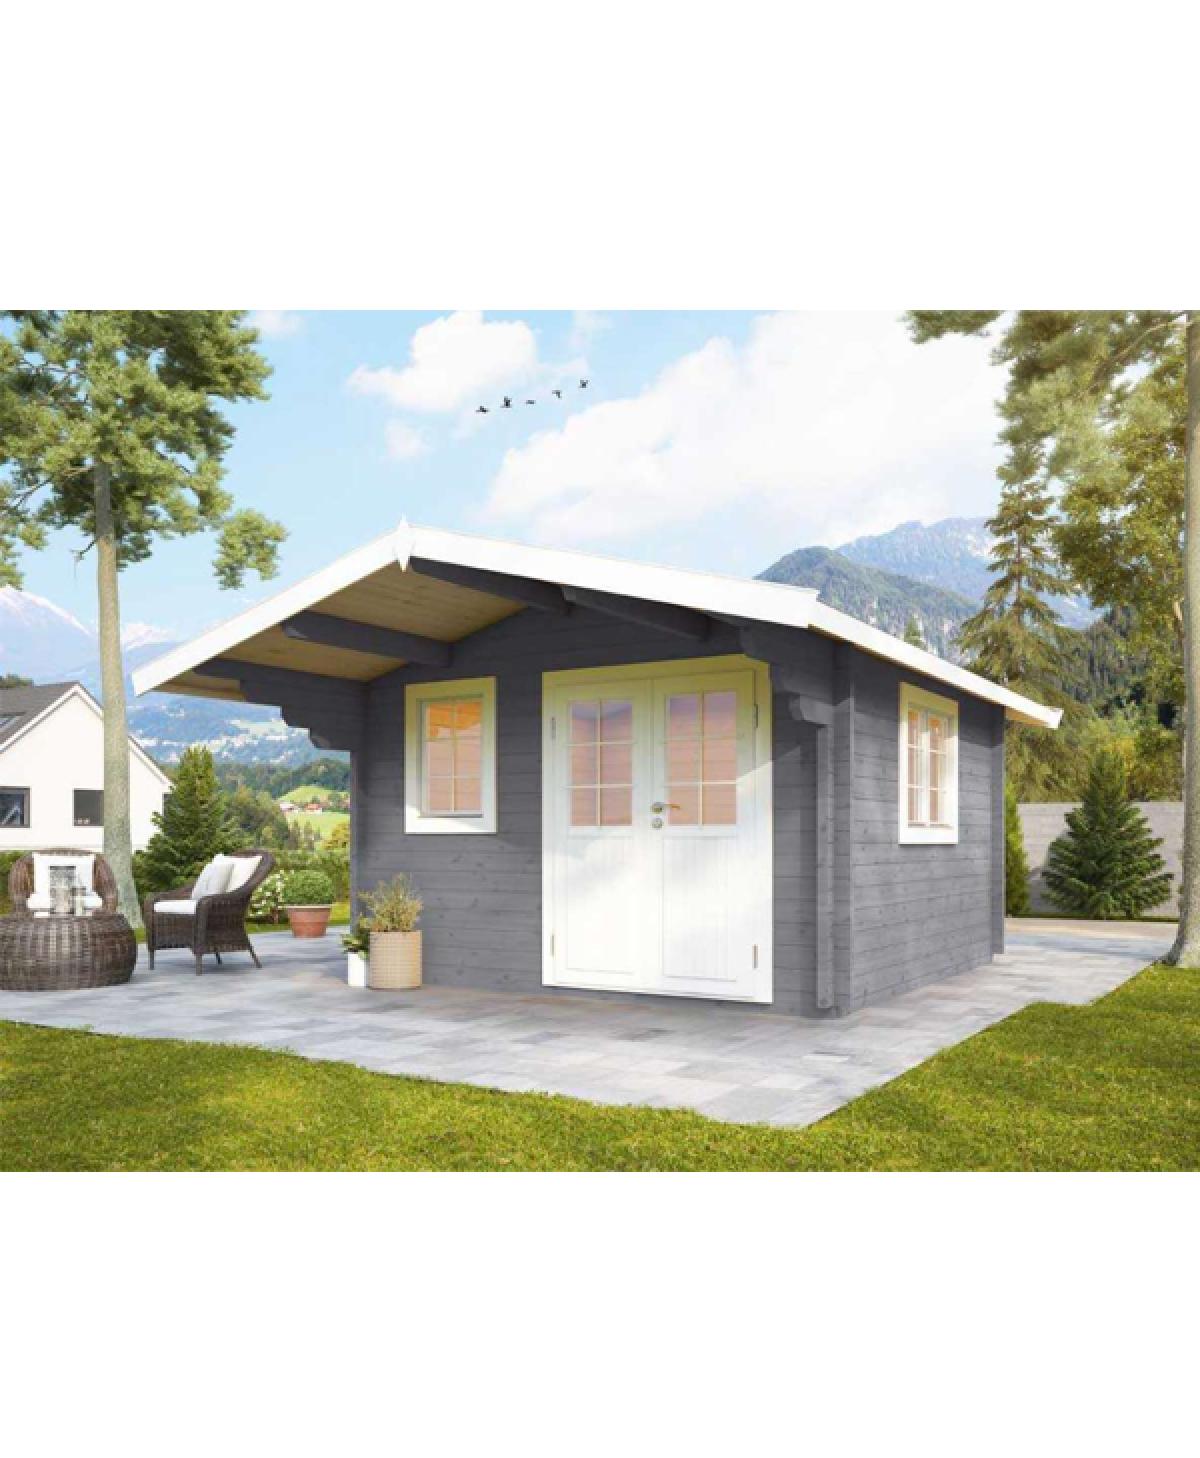 Holzgartenhaus Nova 3636